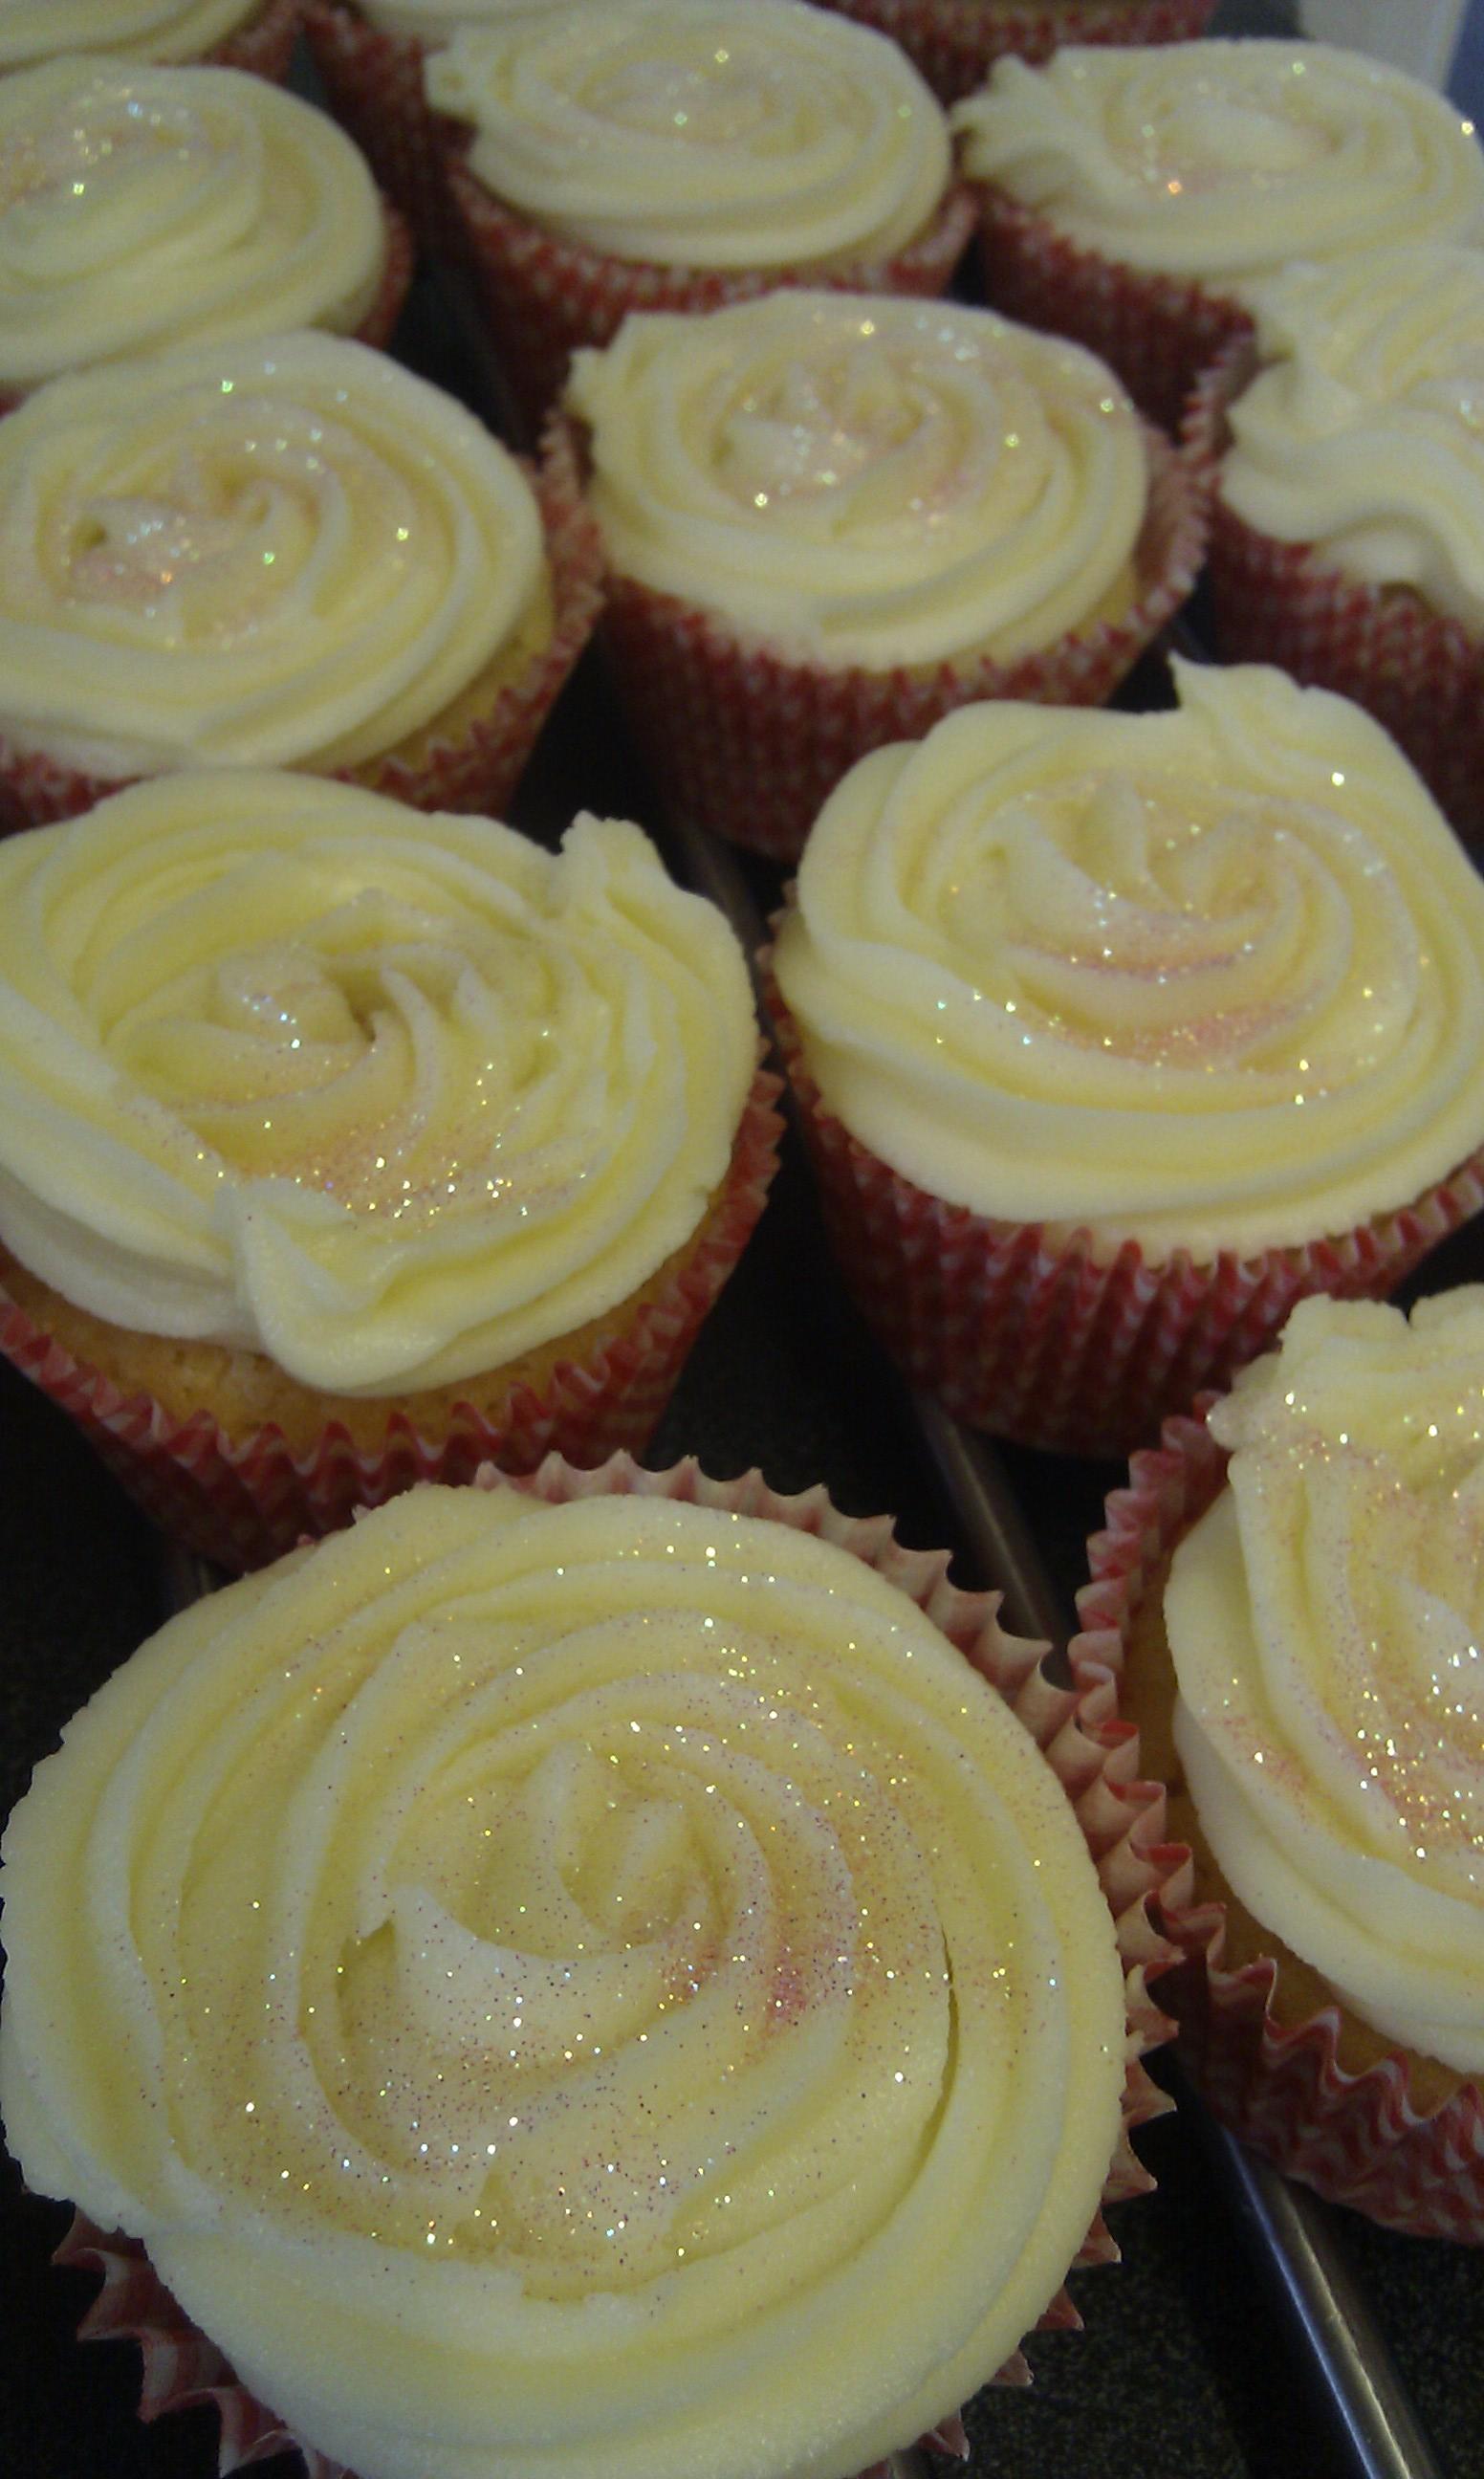 Swirly Cupcake Decorating | The Happy Little Baker